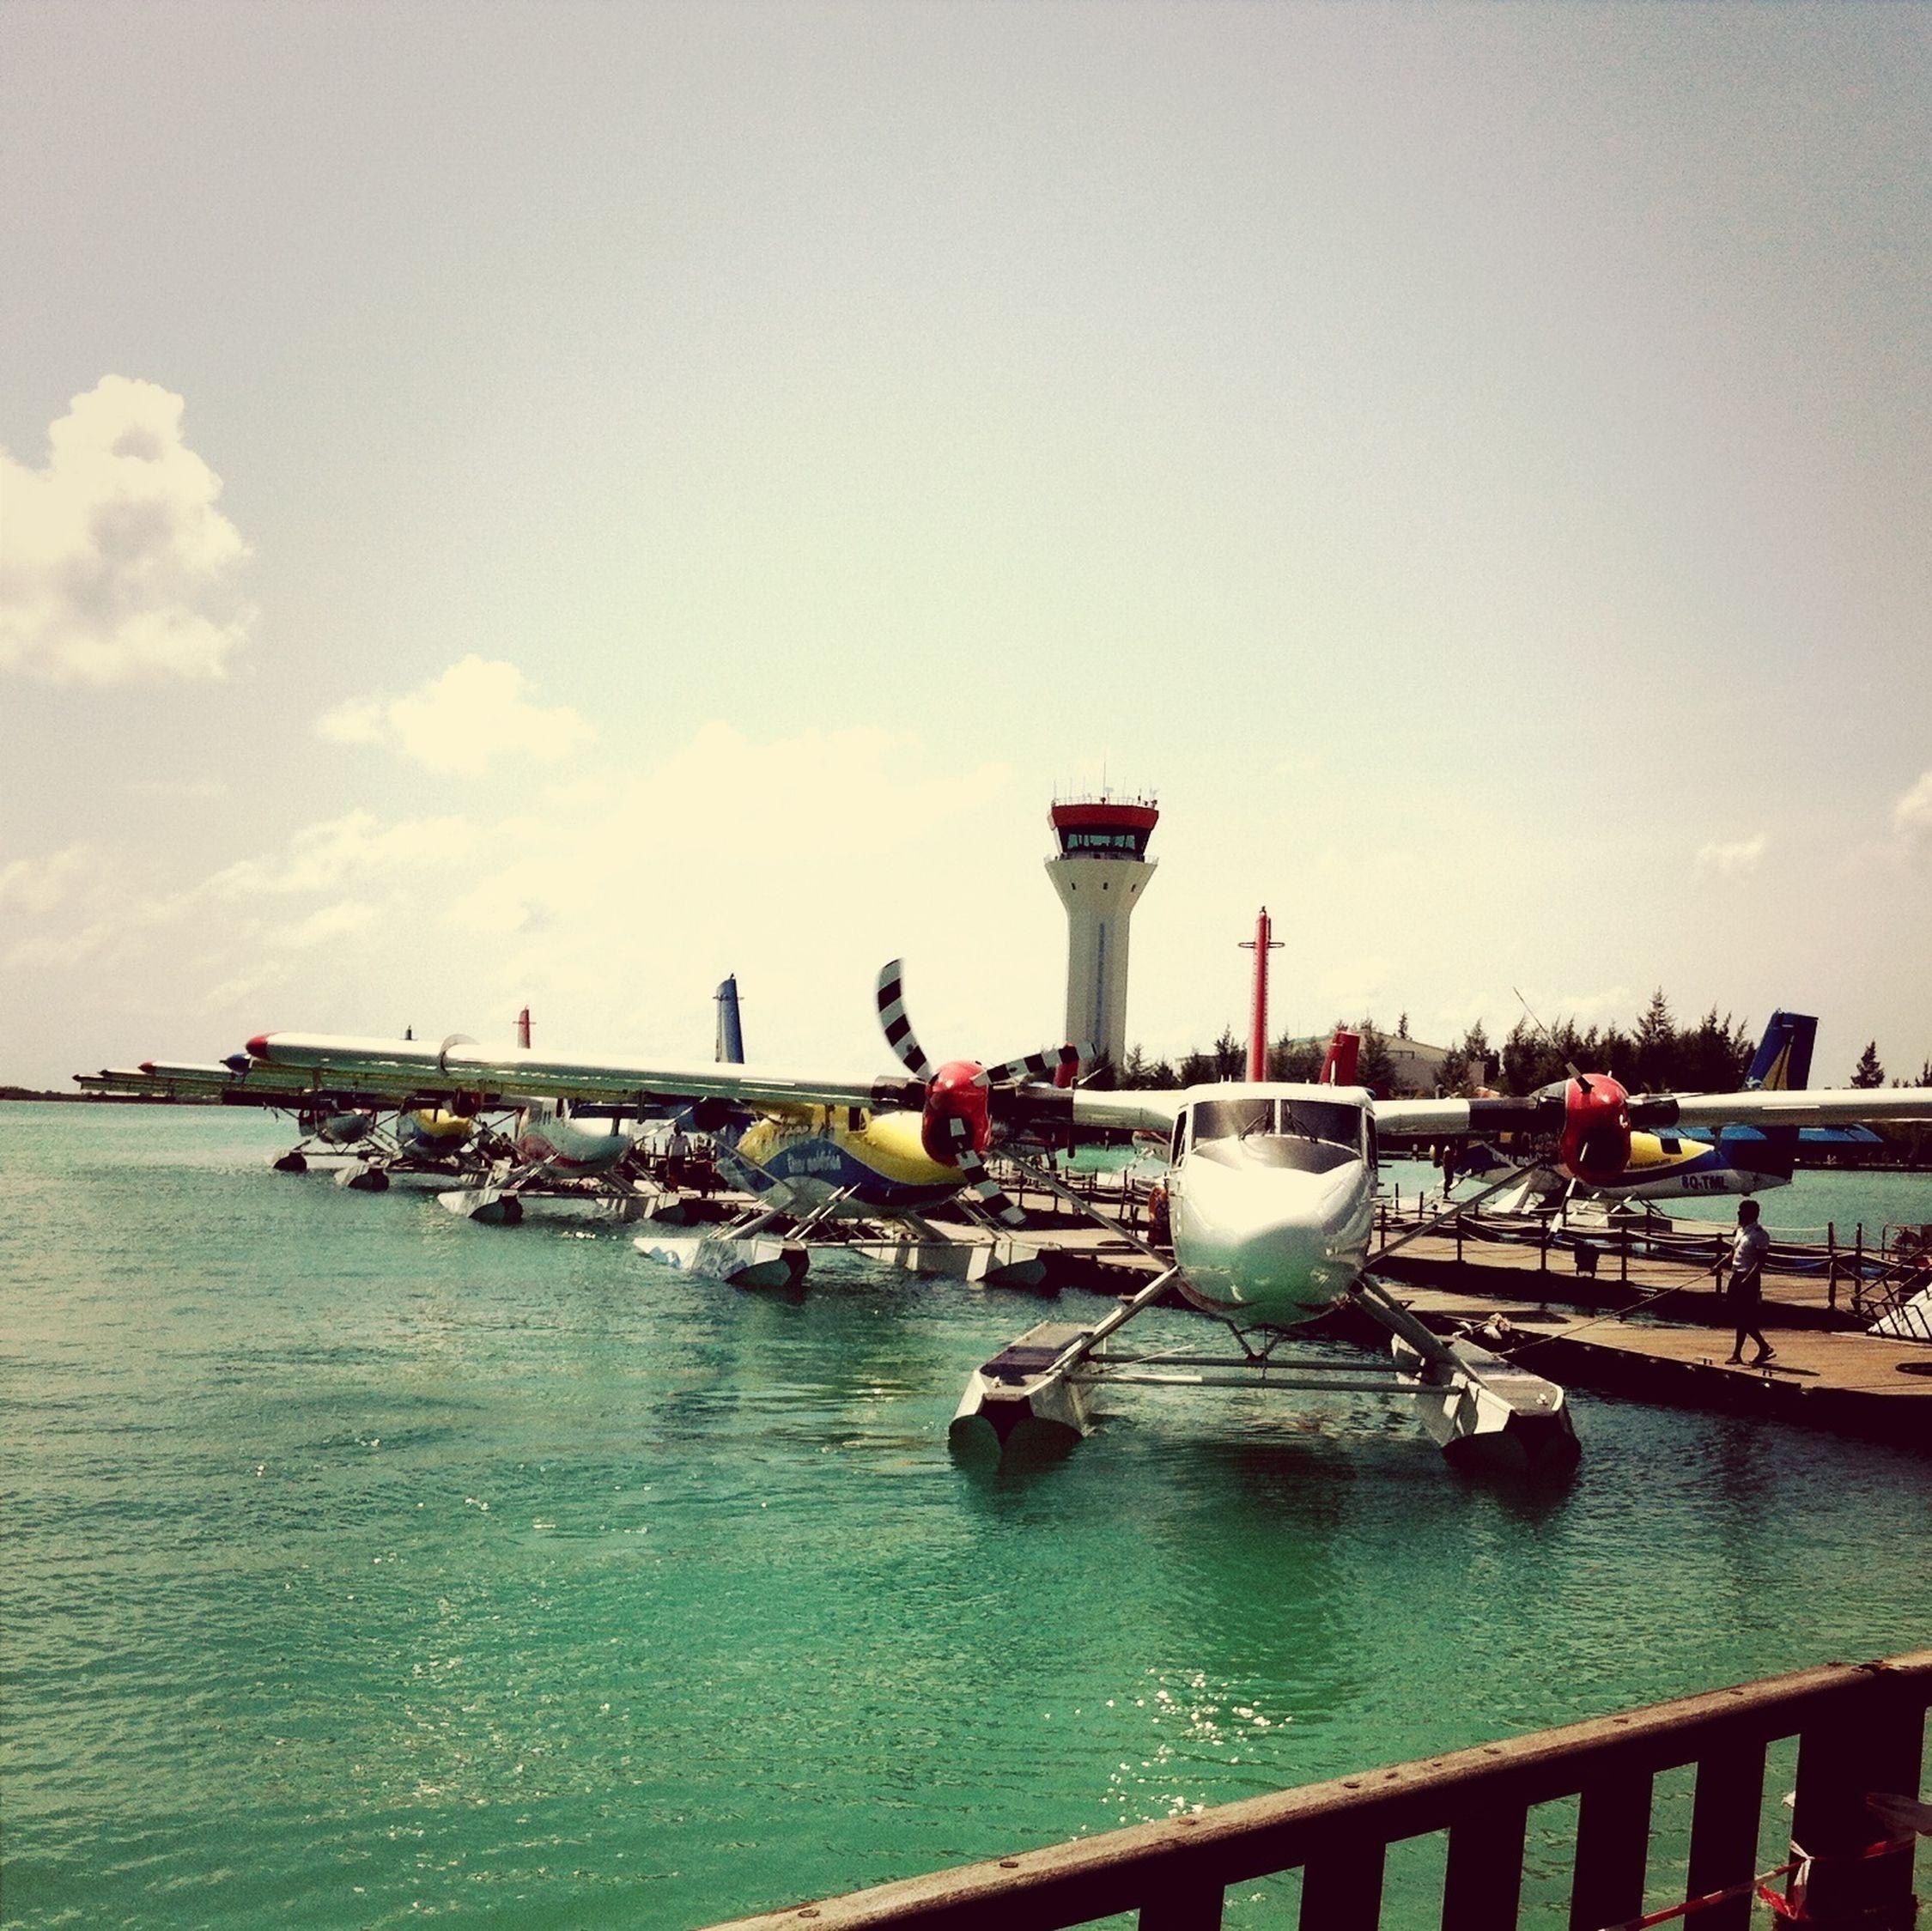 The spirit of maldives